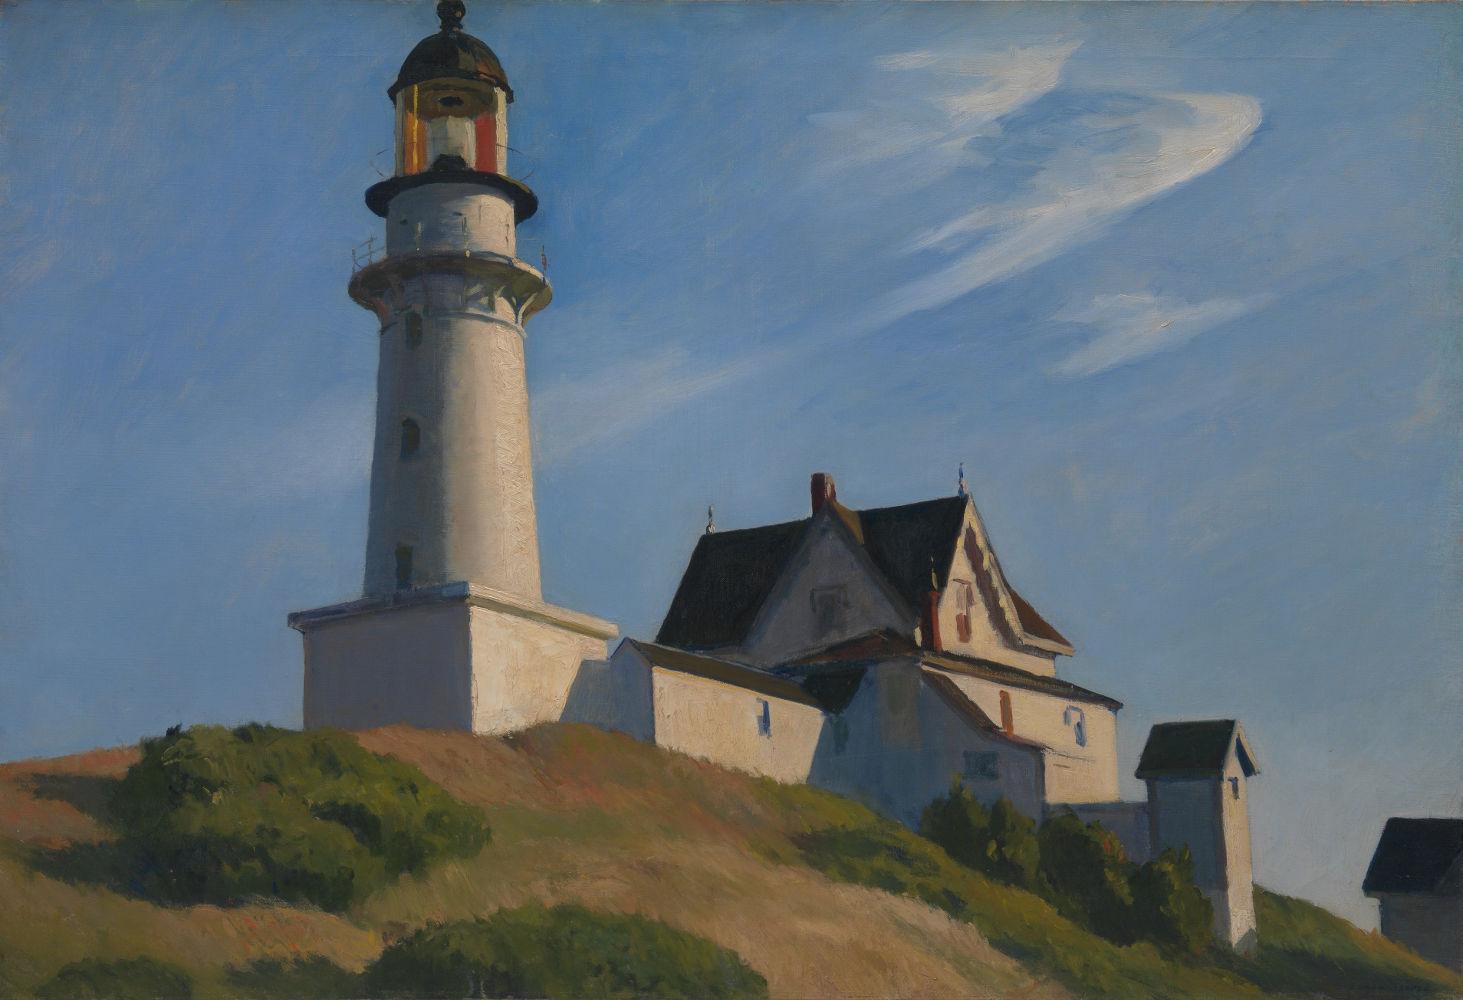 Lighthouse at Two Lights (1929), Μητροπολιτικό Μουσείο της Νέας Υόρκης